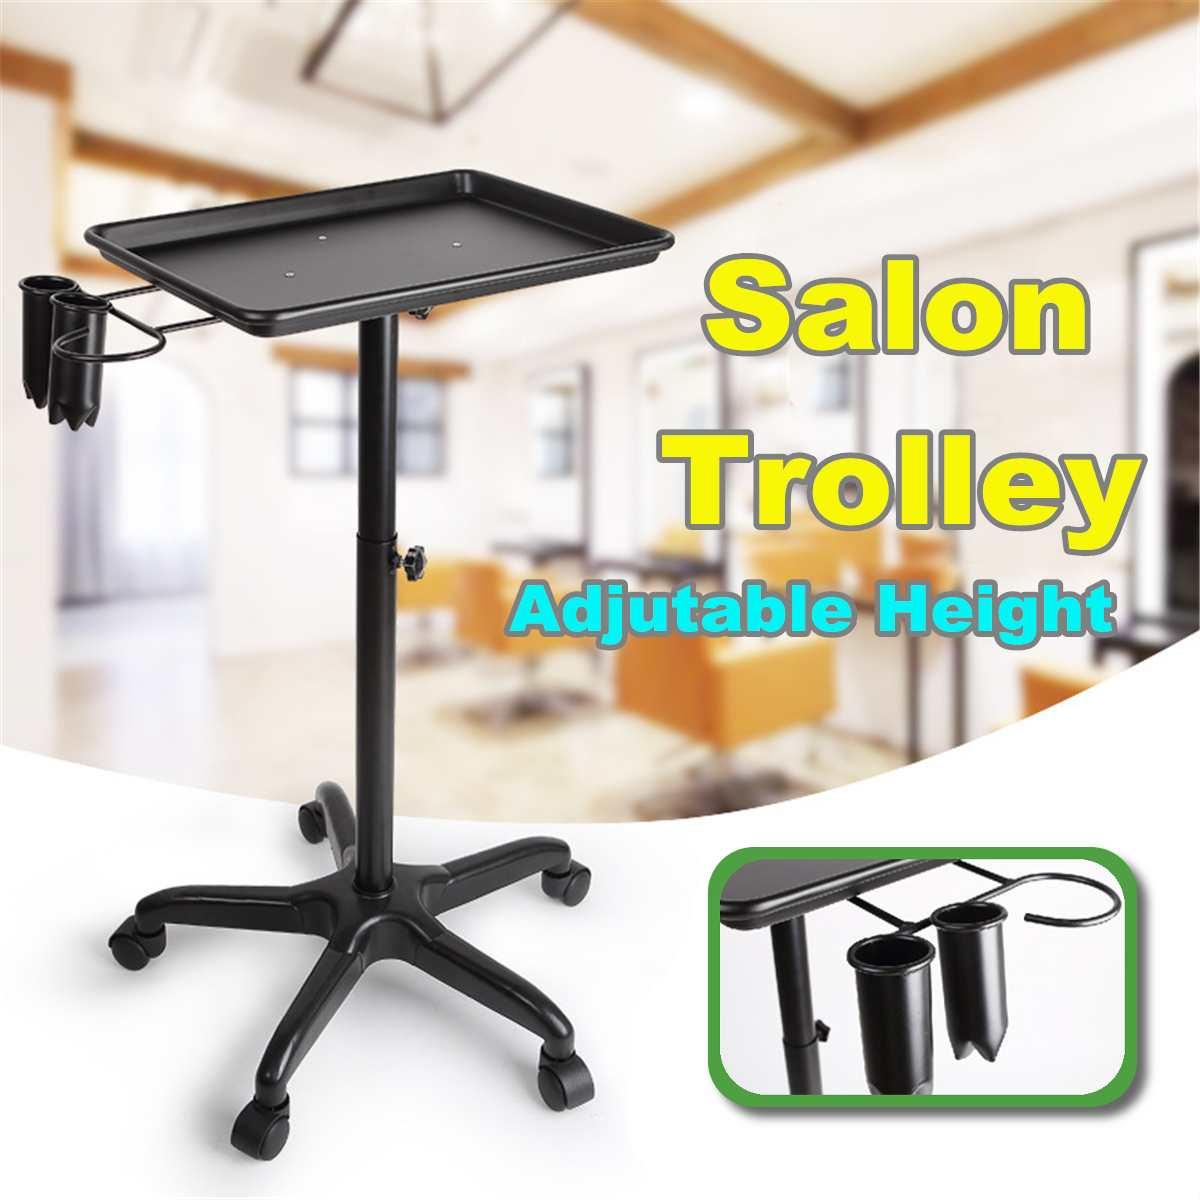 Cart Salon Hairdresser Spa Service Beauty Salon Hairdresser Tattoo Service Trolley Station Colouring Hair Dentist Medical